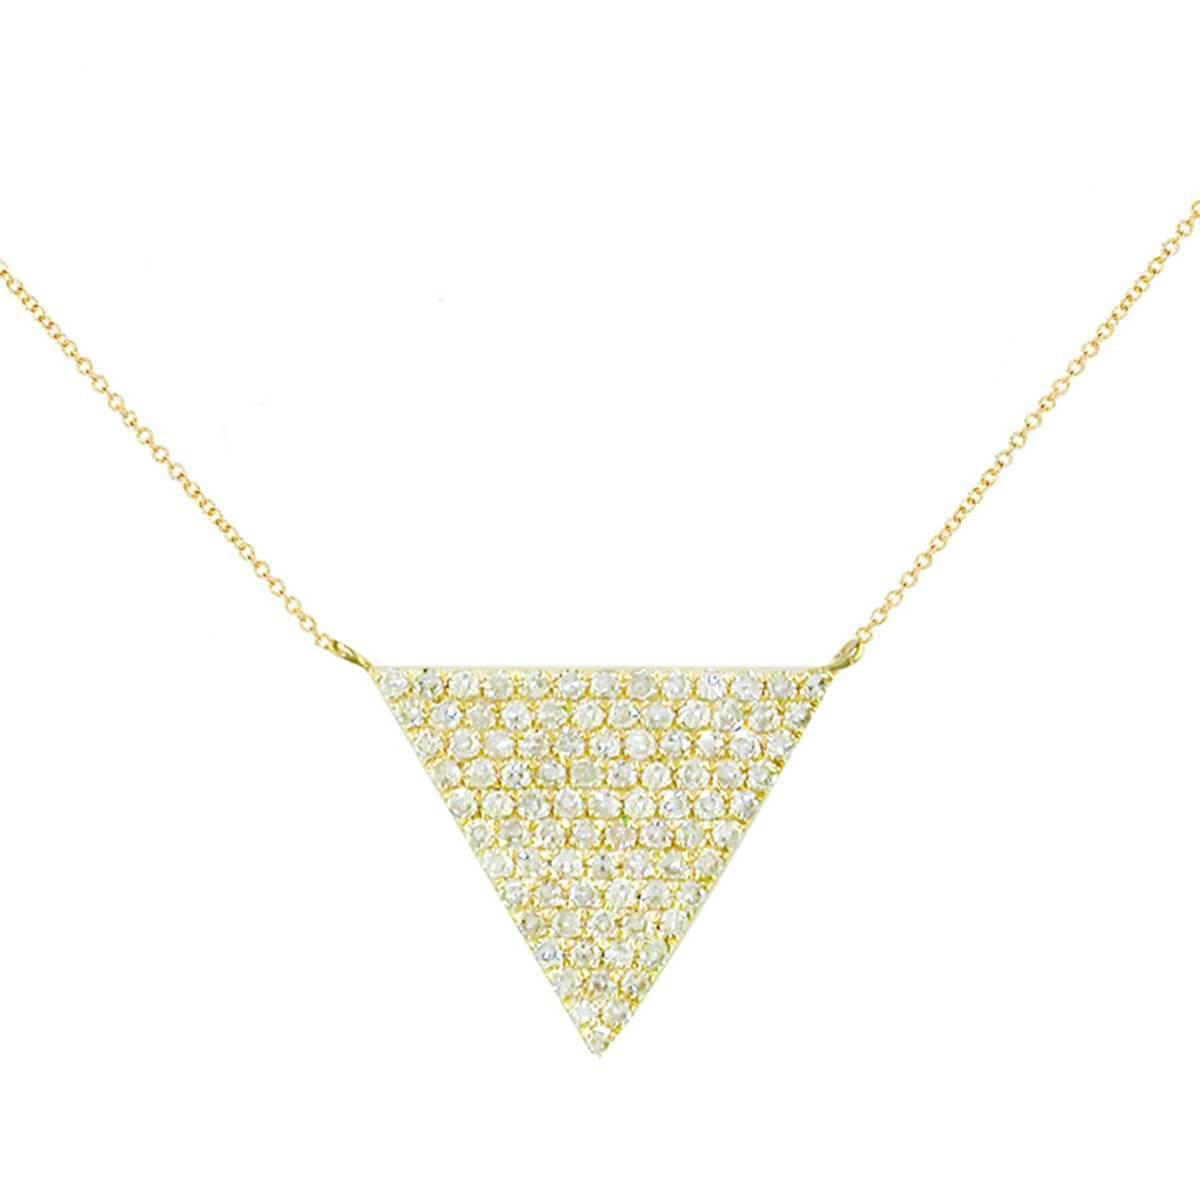 London Road Jewellery Yellow Gold Diamond Triangle Geo Pendant Necklace - 0.10cts ukcaiDoLom